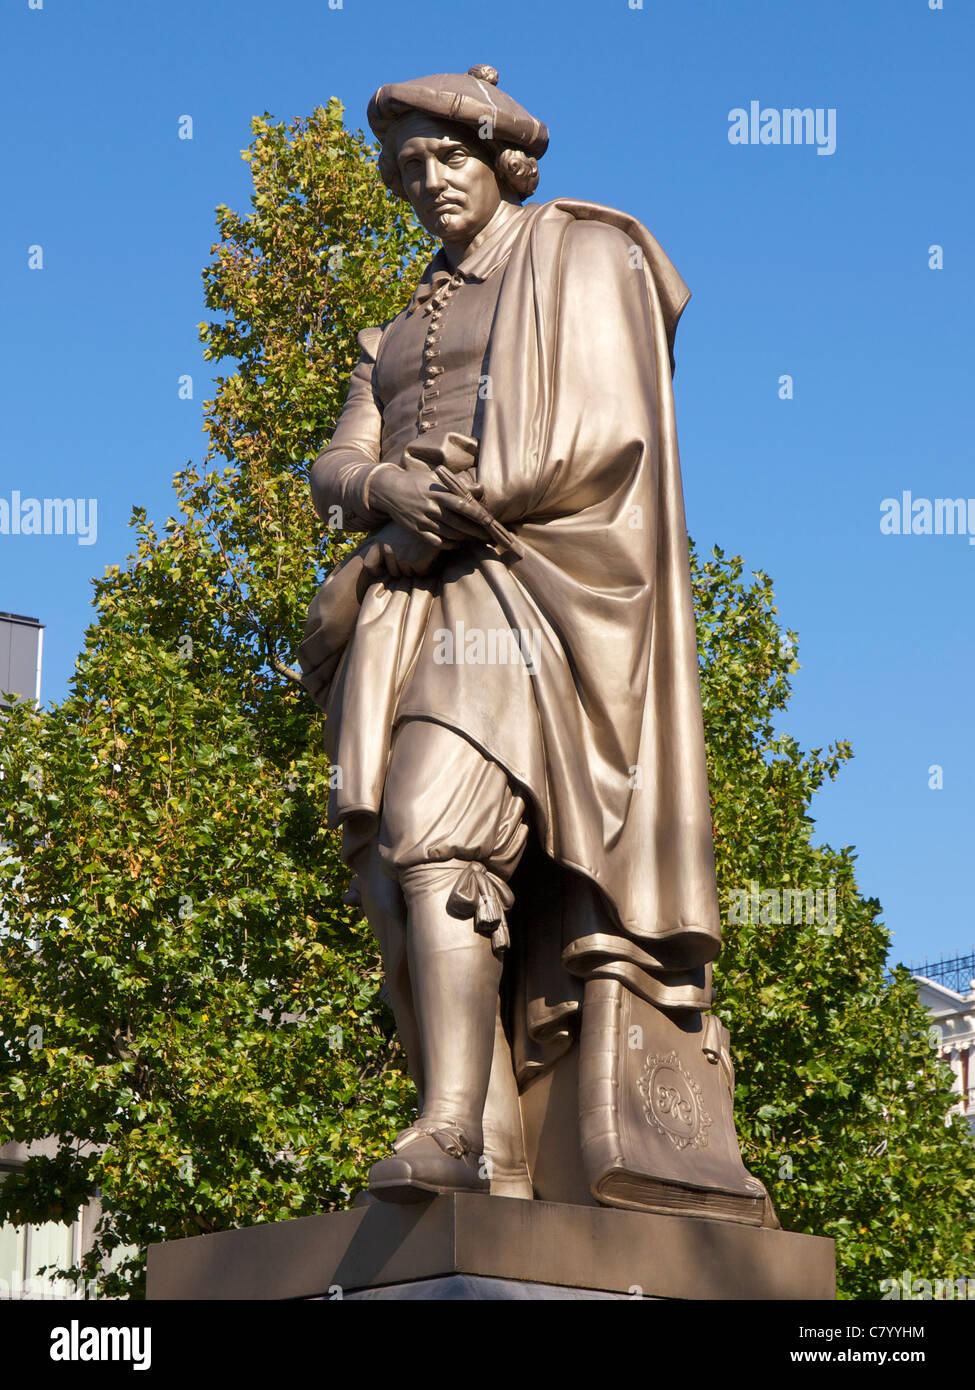 Statue of the famous painter Rembrandt van Rijn on the